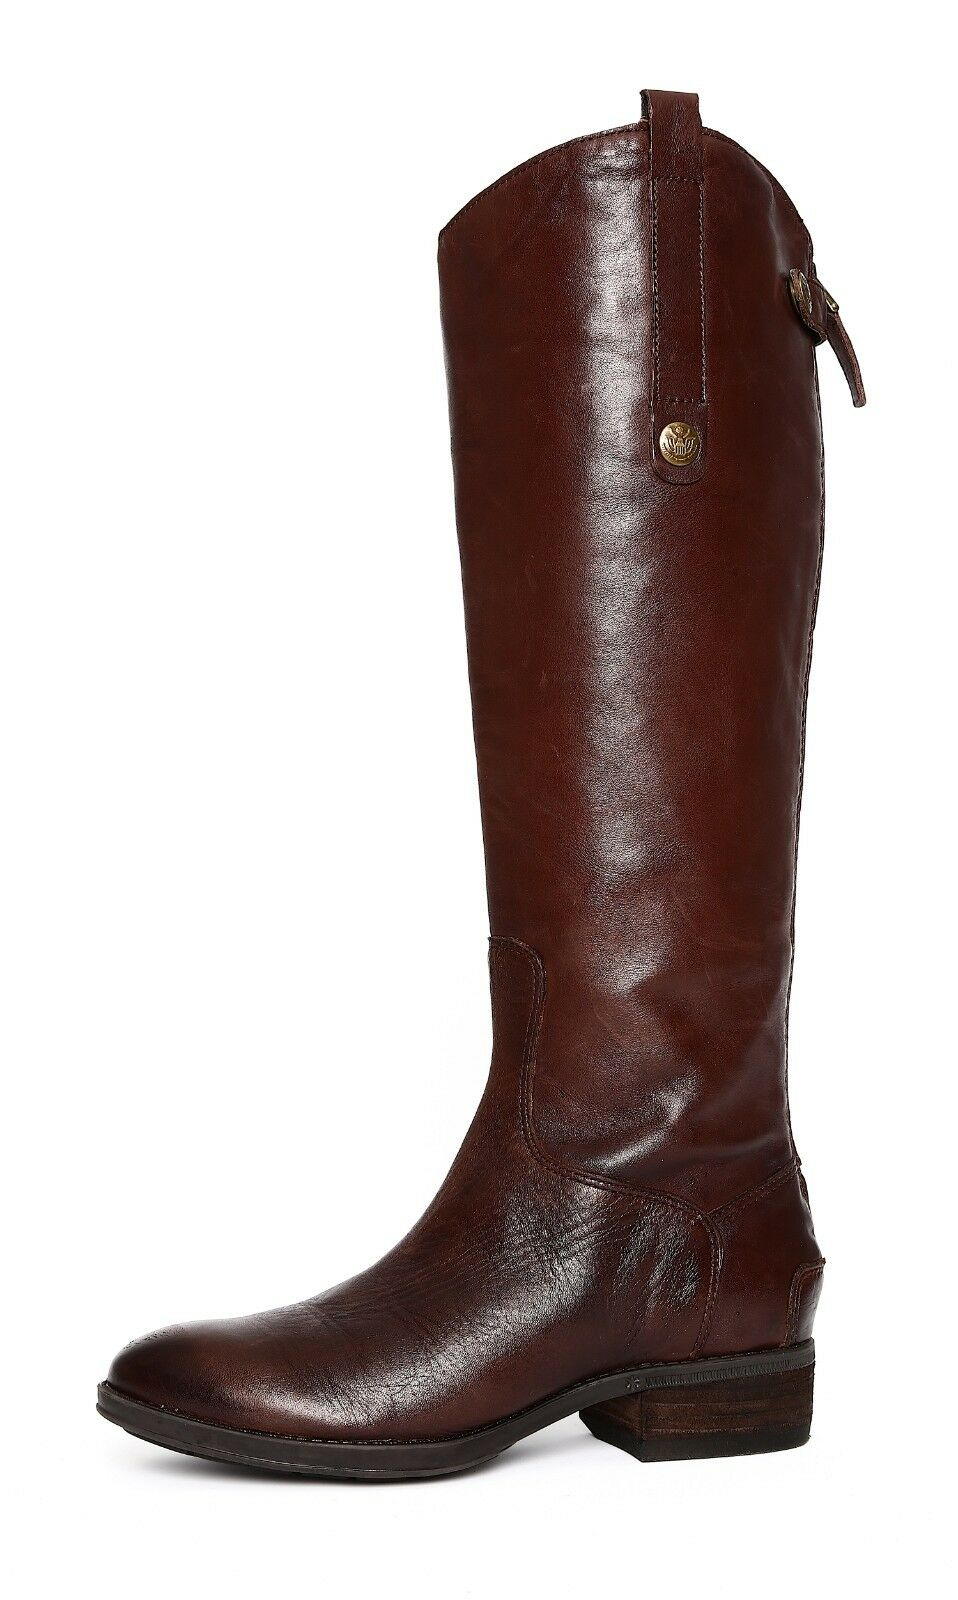 Sam Edelman Penny Donna Dark Brown Boot Sz 5 6790